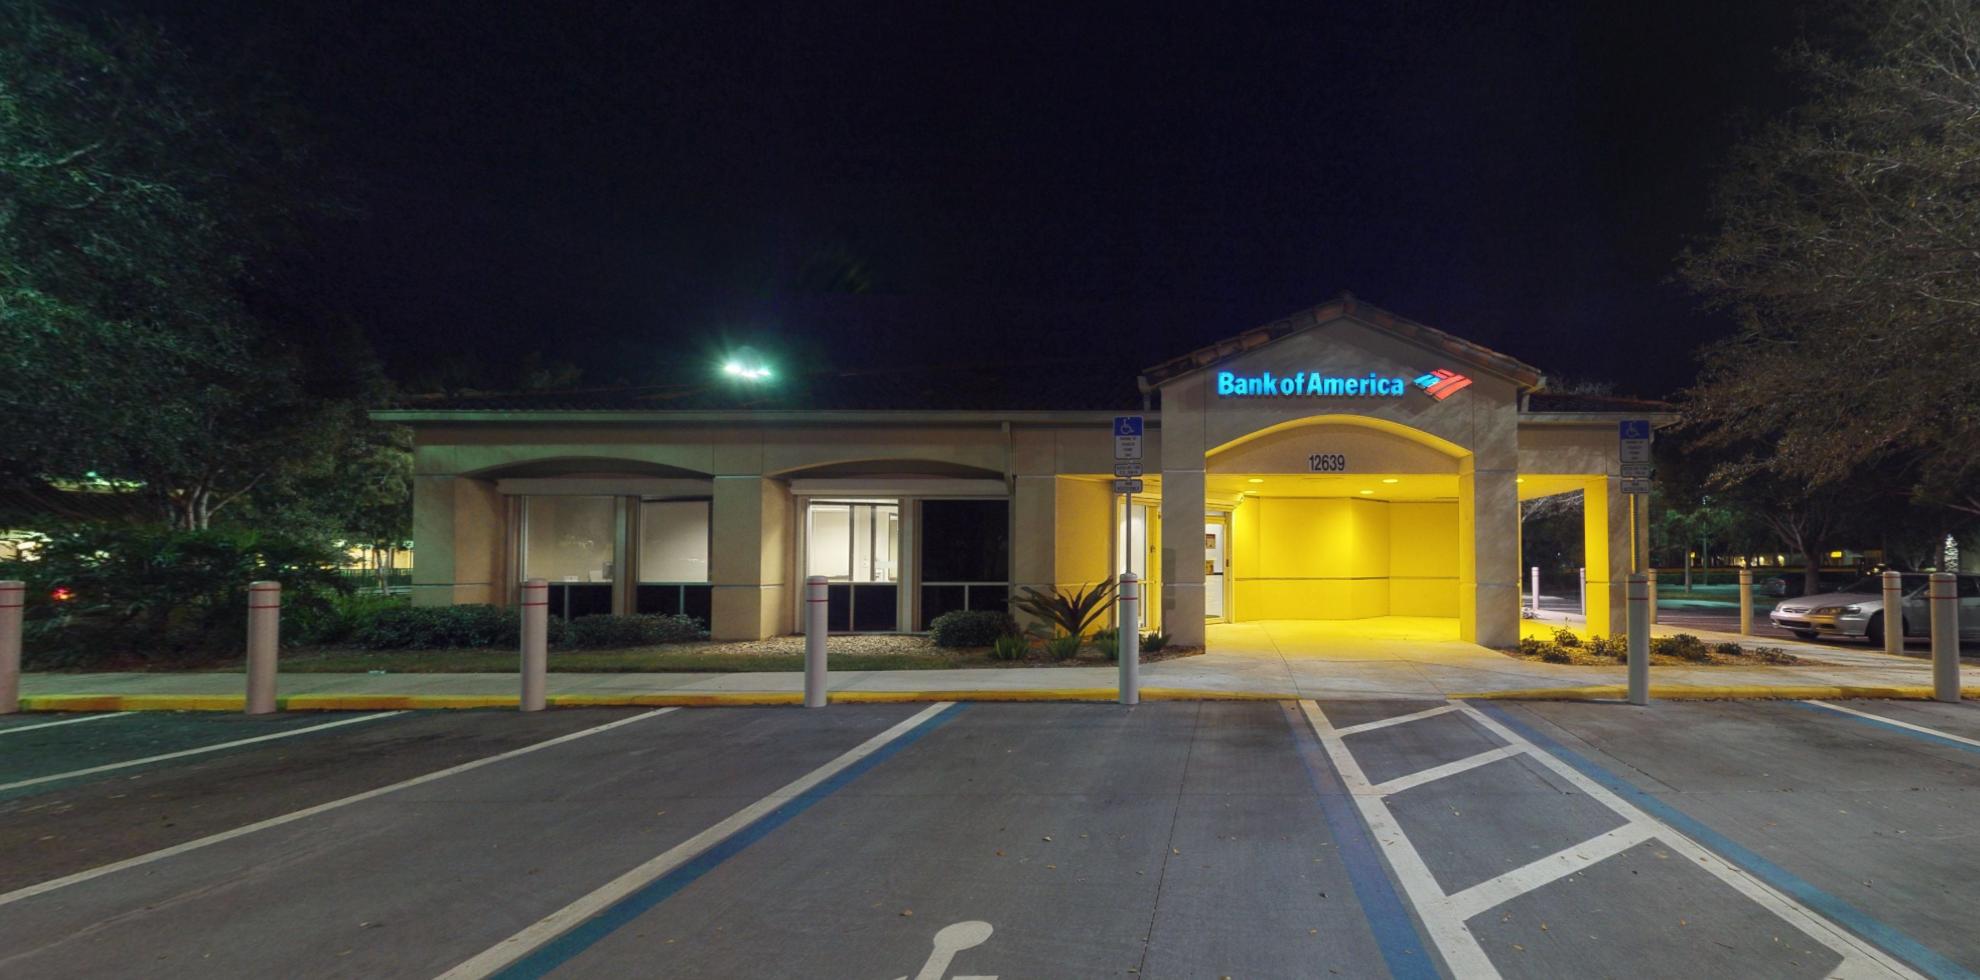 Bank of America financial center with drive-thru ATM | 12639 Tamiami Trl E, Naples, FL 34113